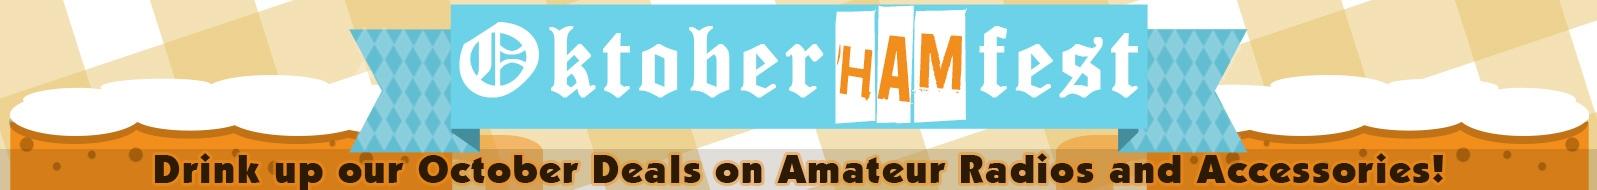 OktoberHamFest Promotion